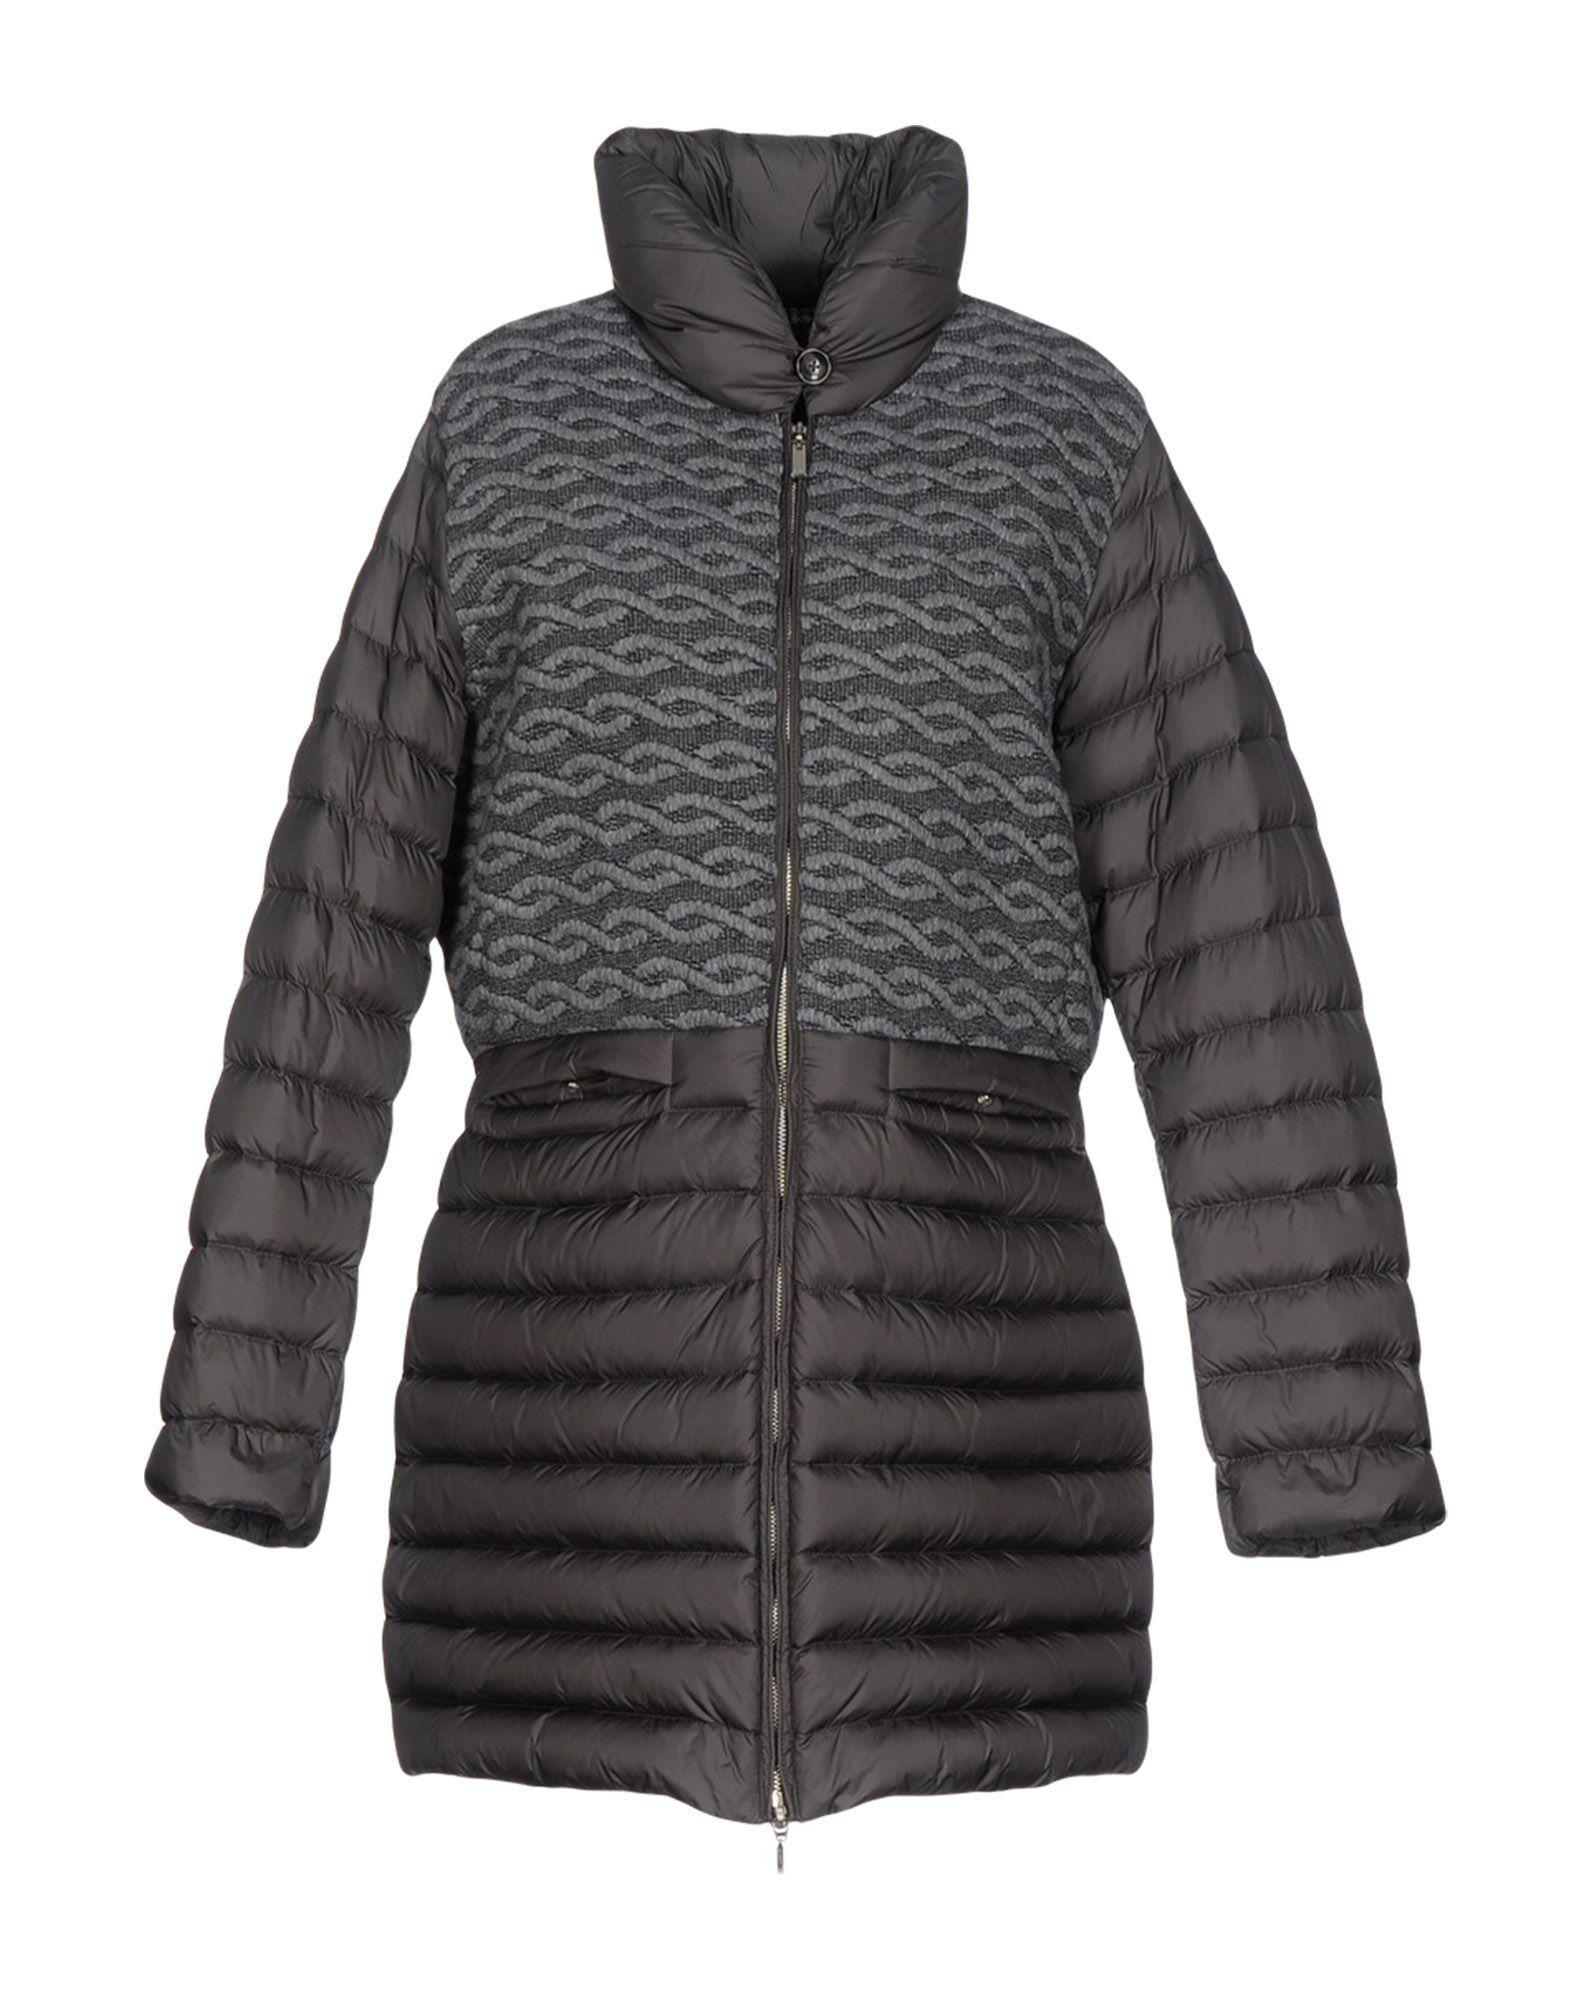 Geox Down Jackets In Grey